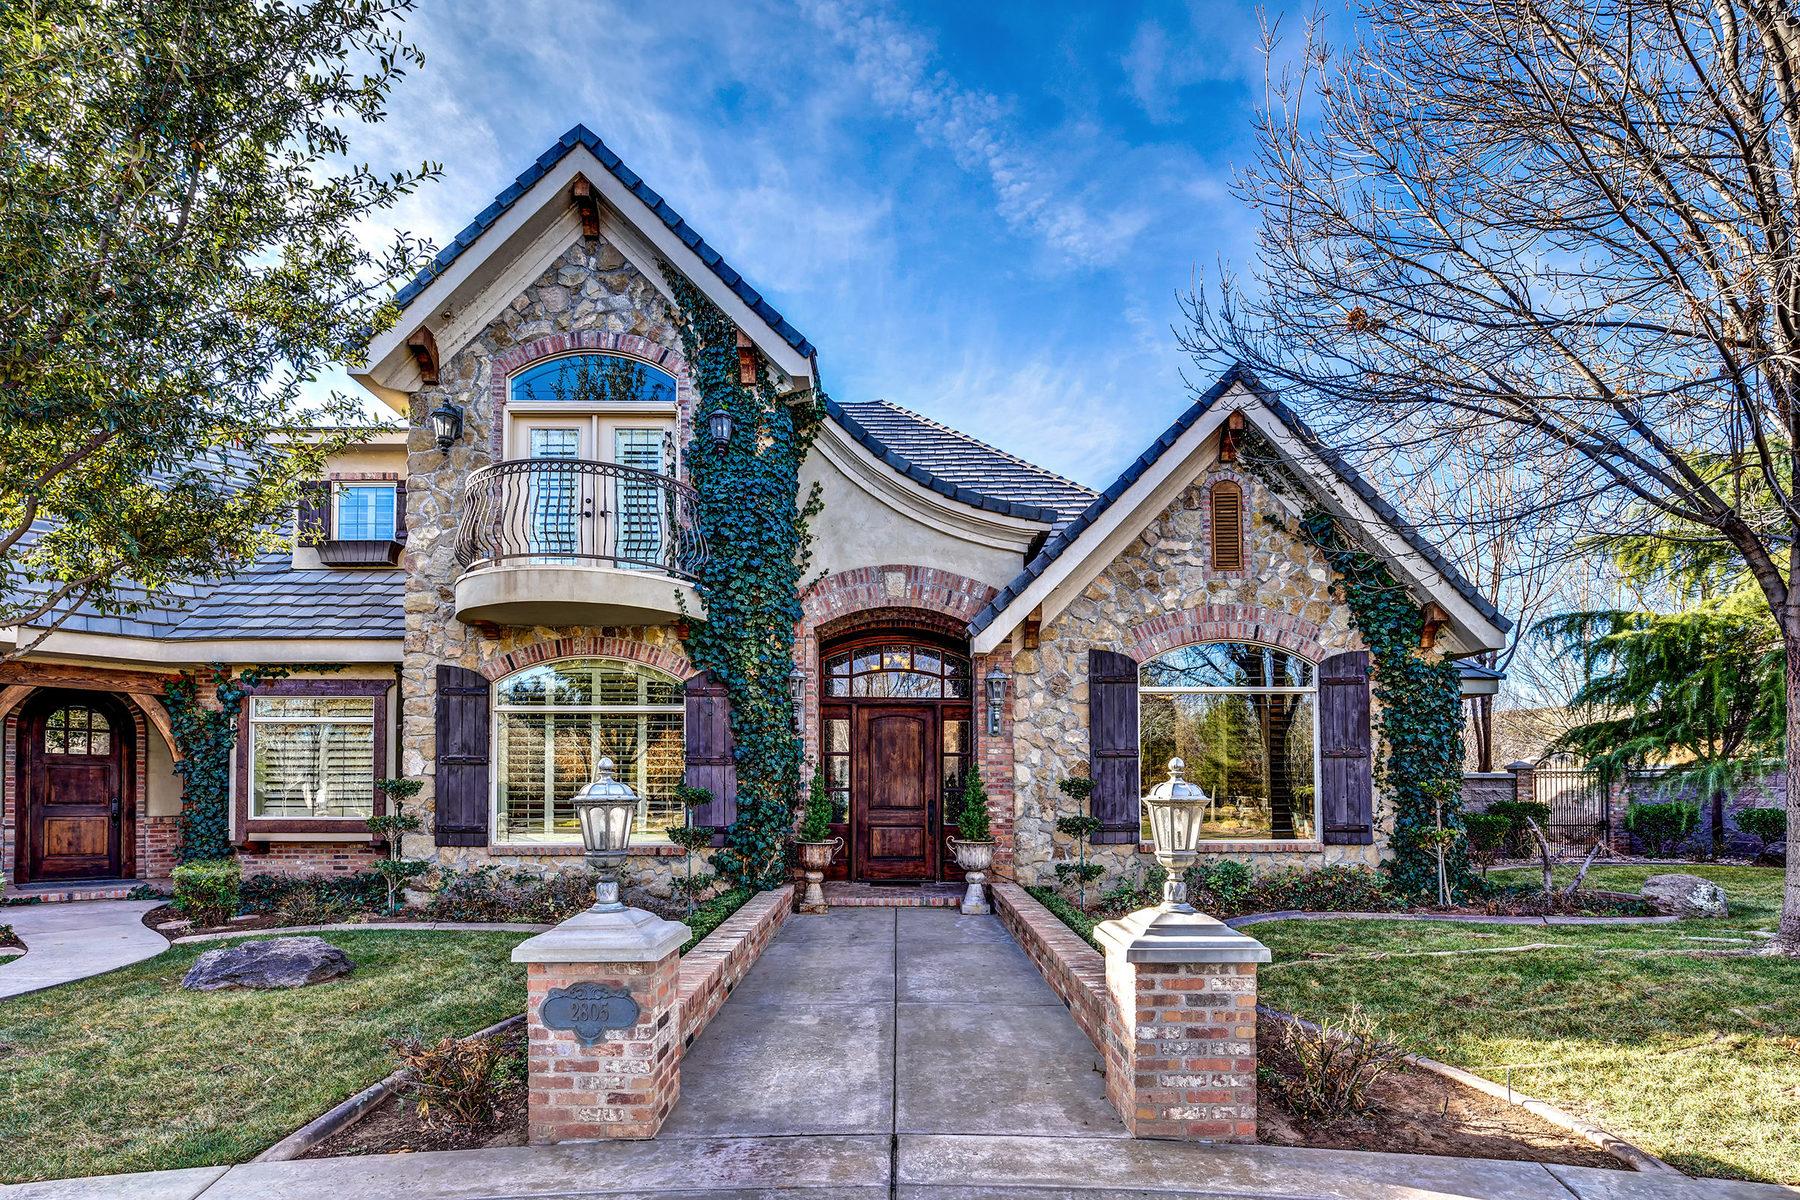 Single Family Home for Sale at Sanctuary in Santa Clara 2805 Cottonwood Cir Santa Clara, Utah, 84765 United States